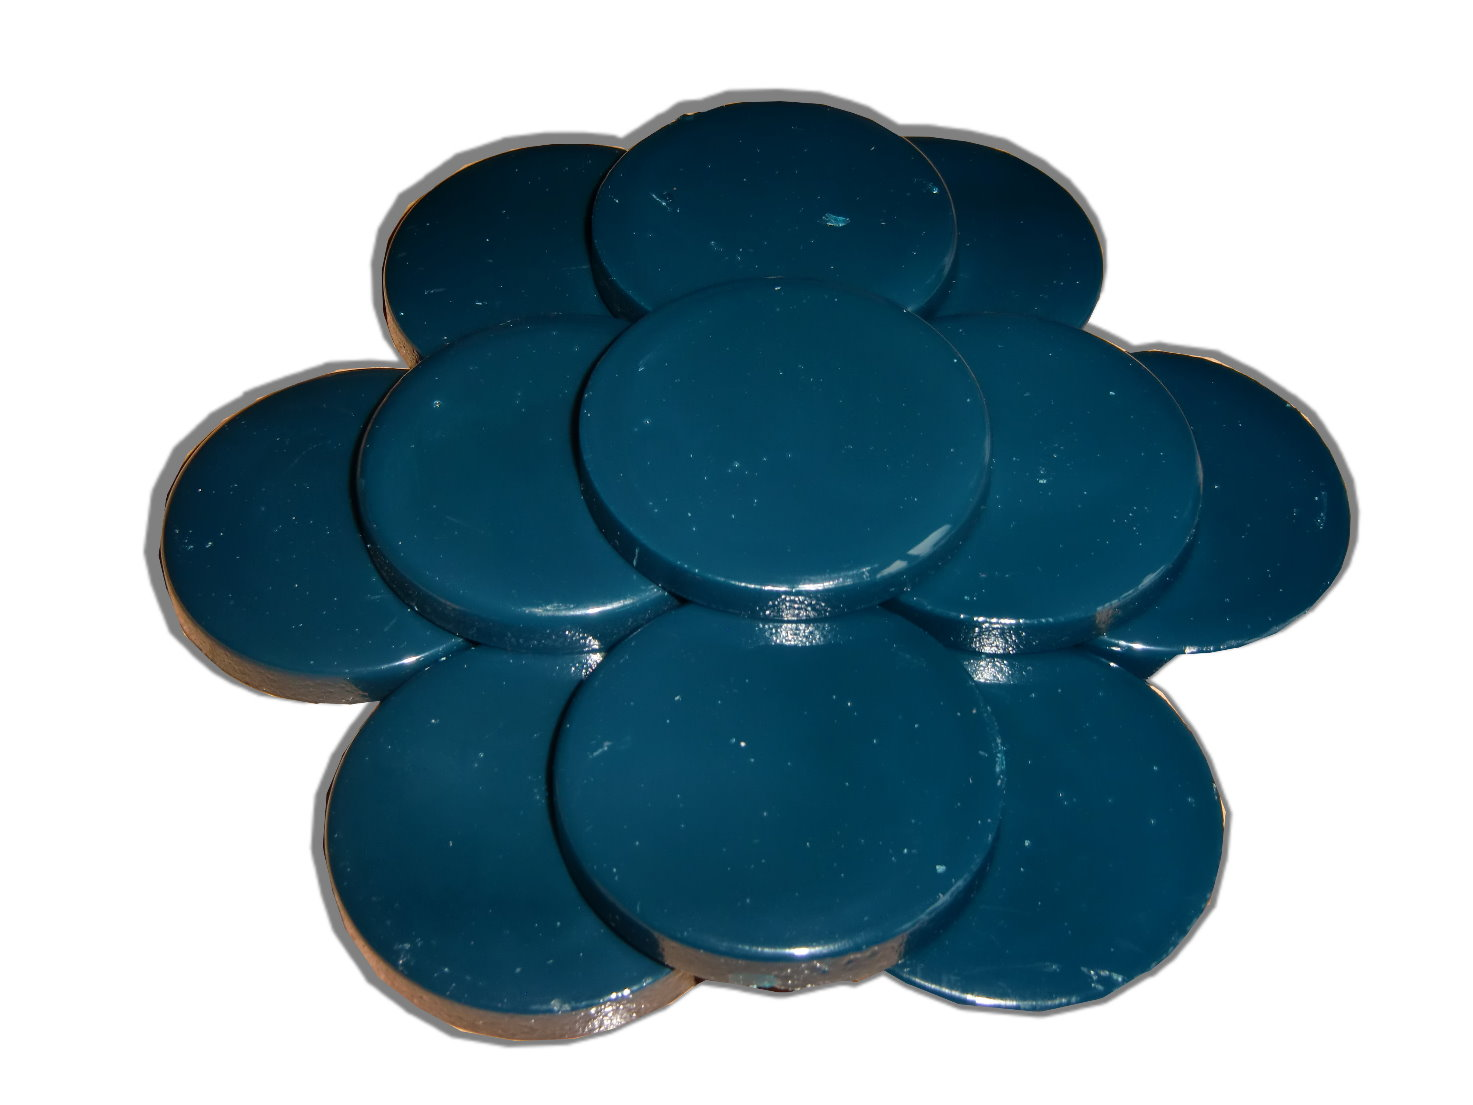 Cire magique ou cire bleue mais une cire pelable